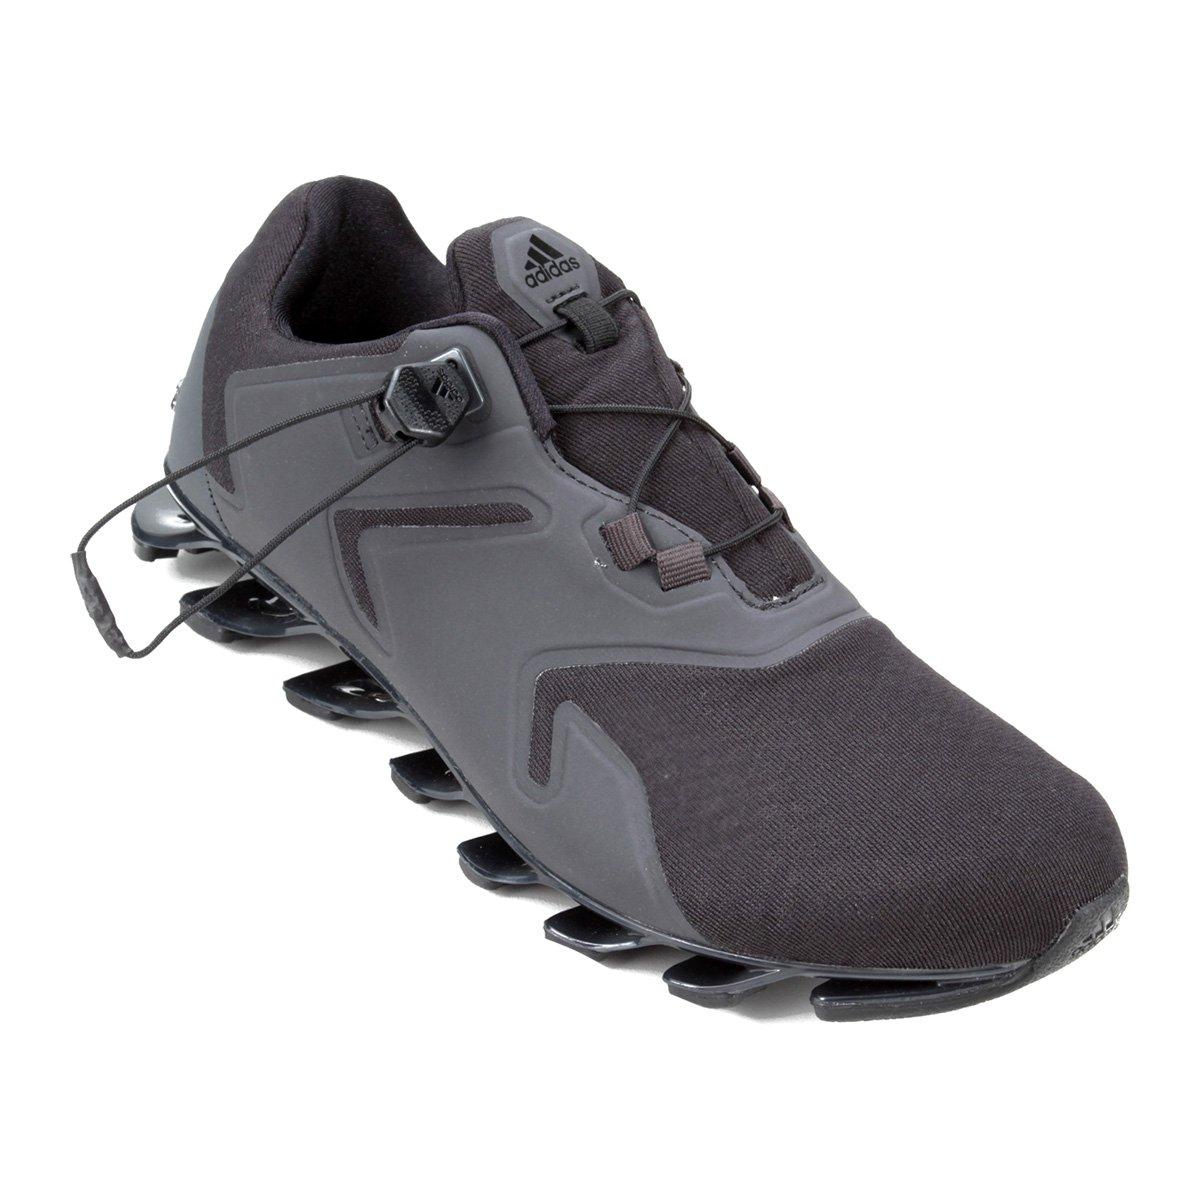 innovative design 6d2c6 23ef5 Tênis Adidas Springblade Solyce Masculino   Netshoes